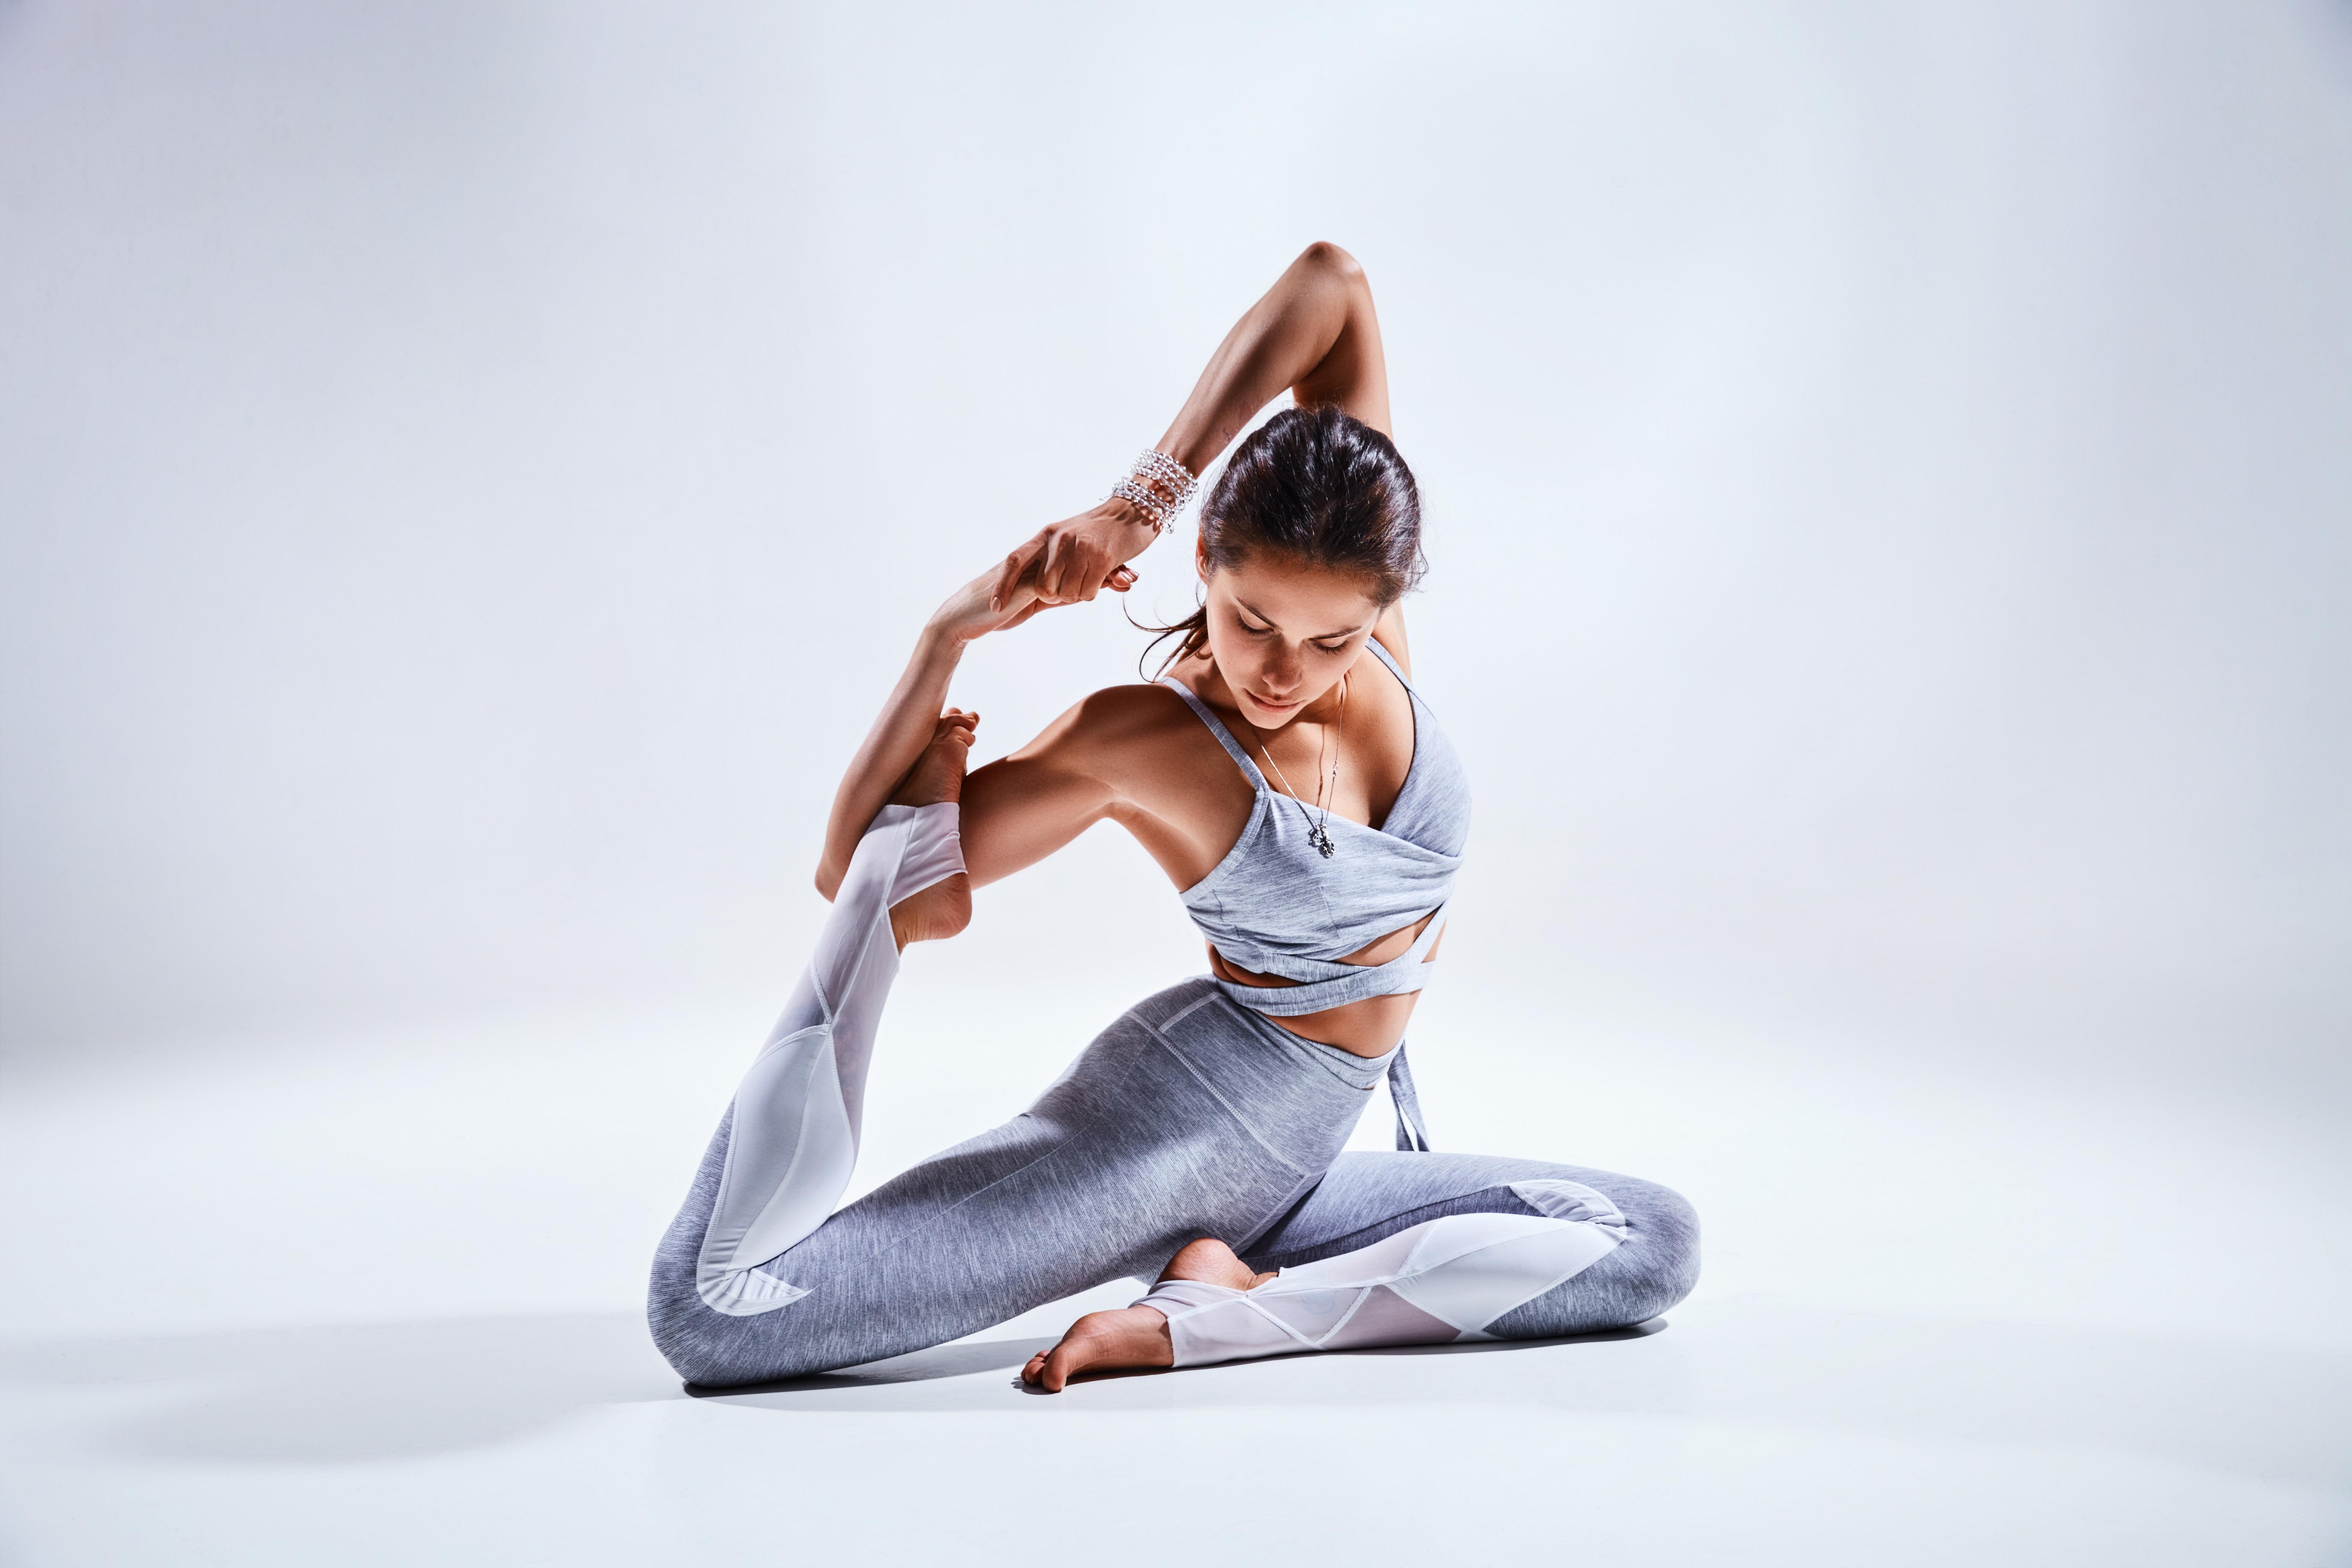 pilates-hareket-fayda